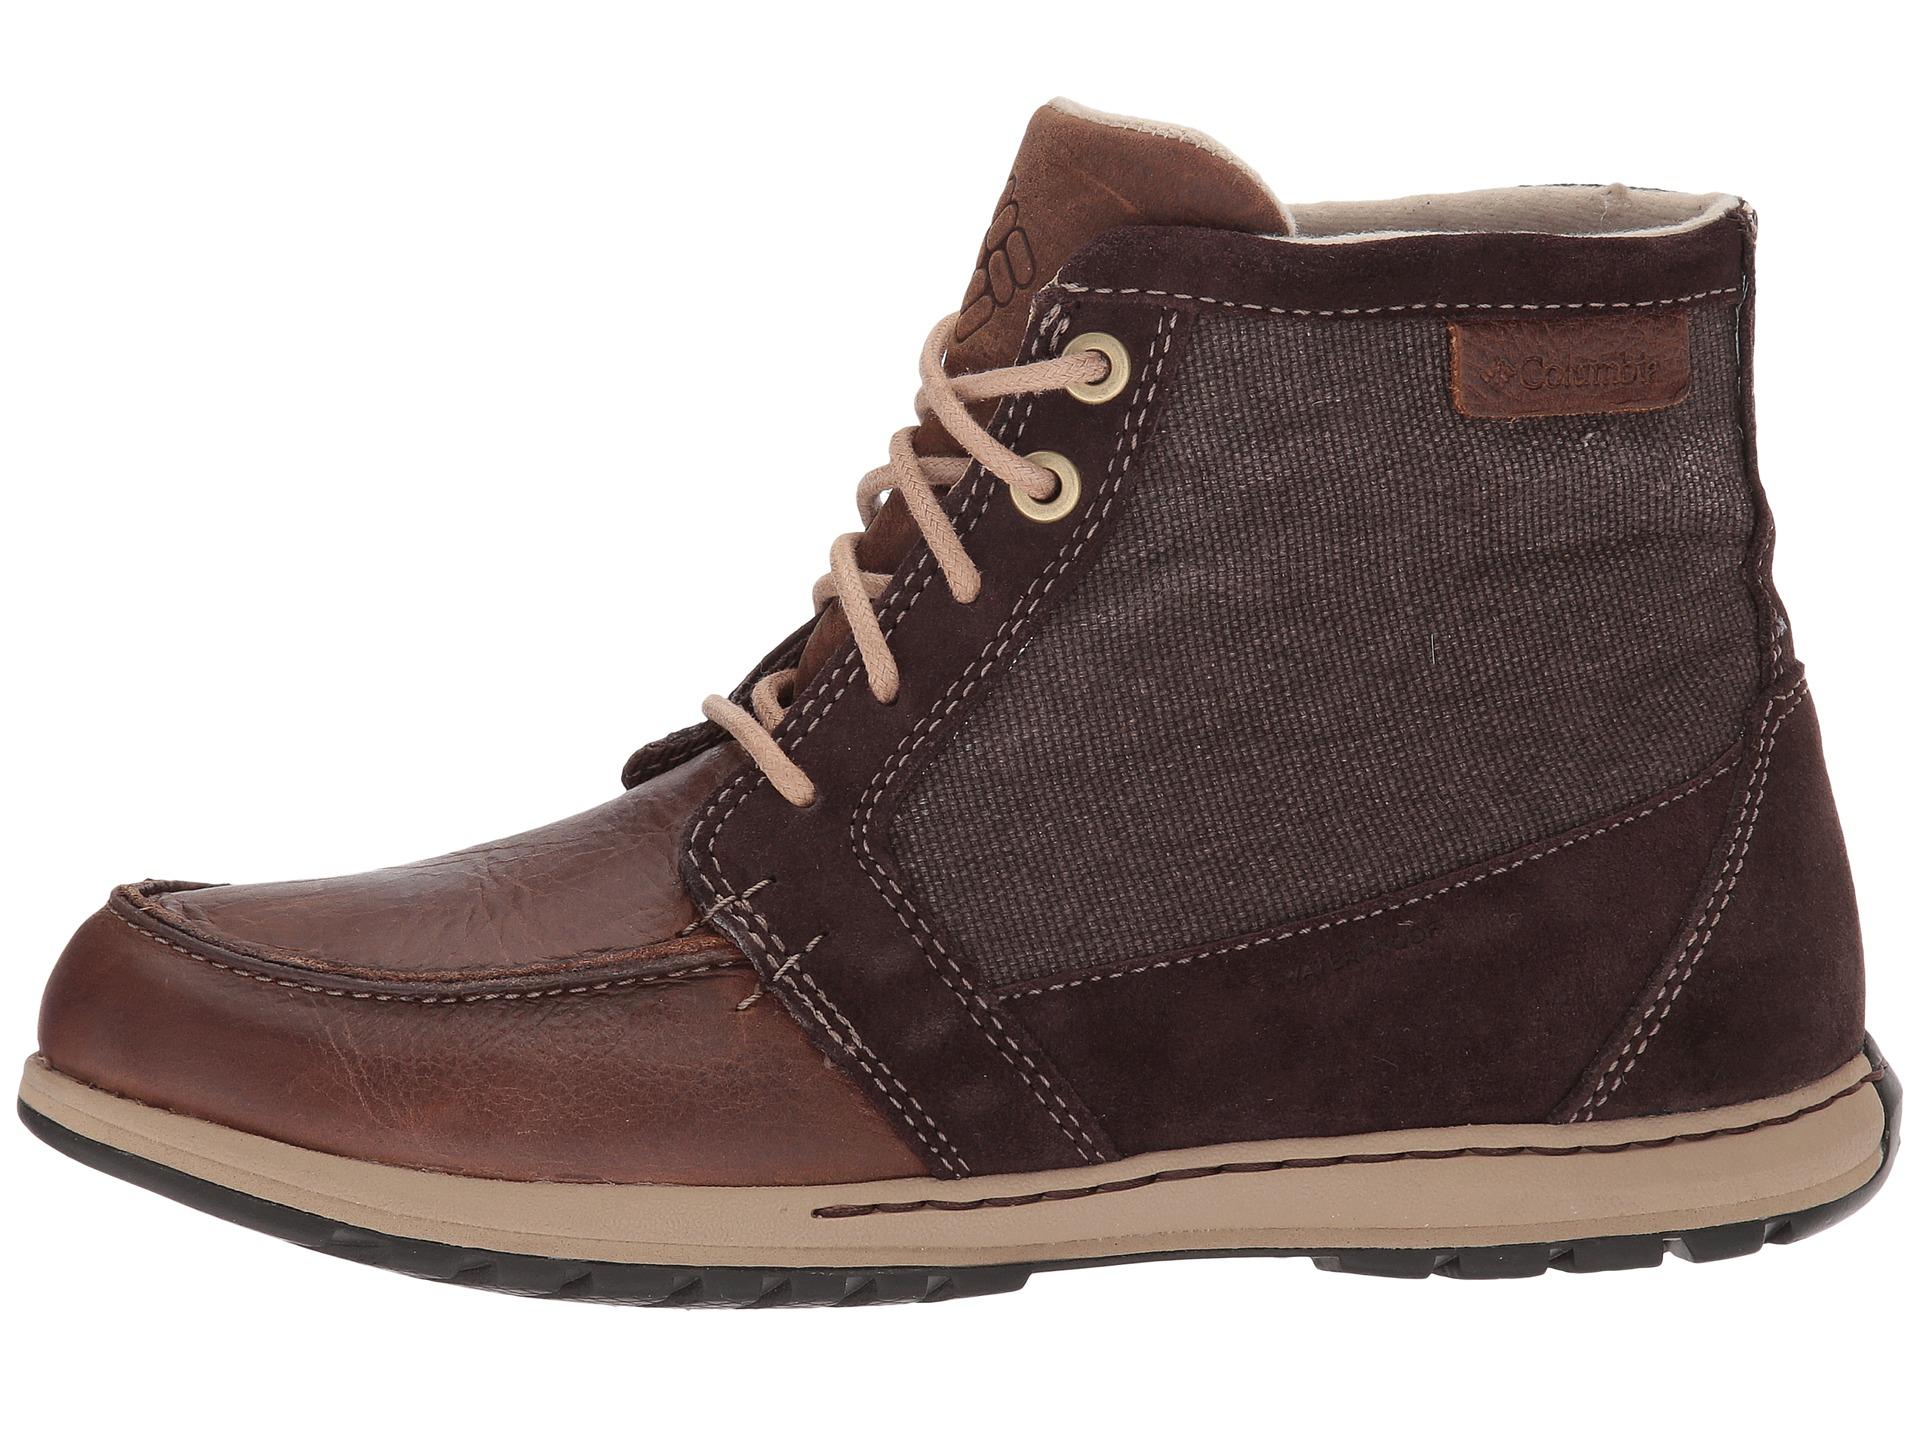 Columbia Davenport Pdx Shoe Size